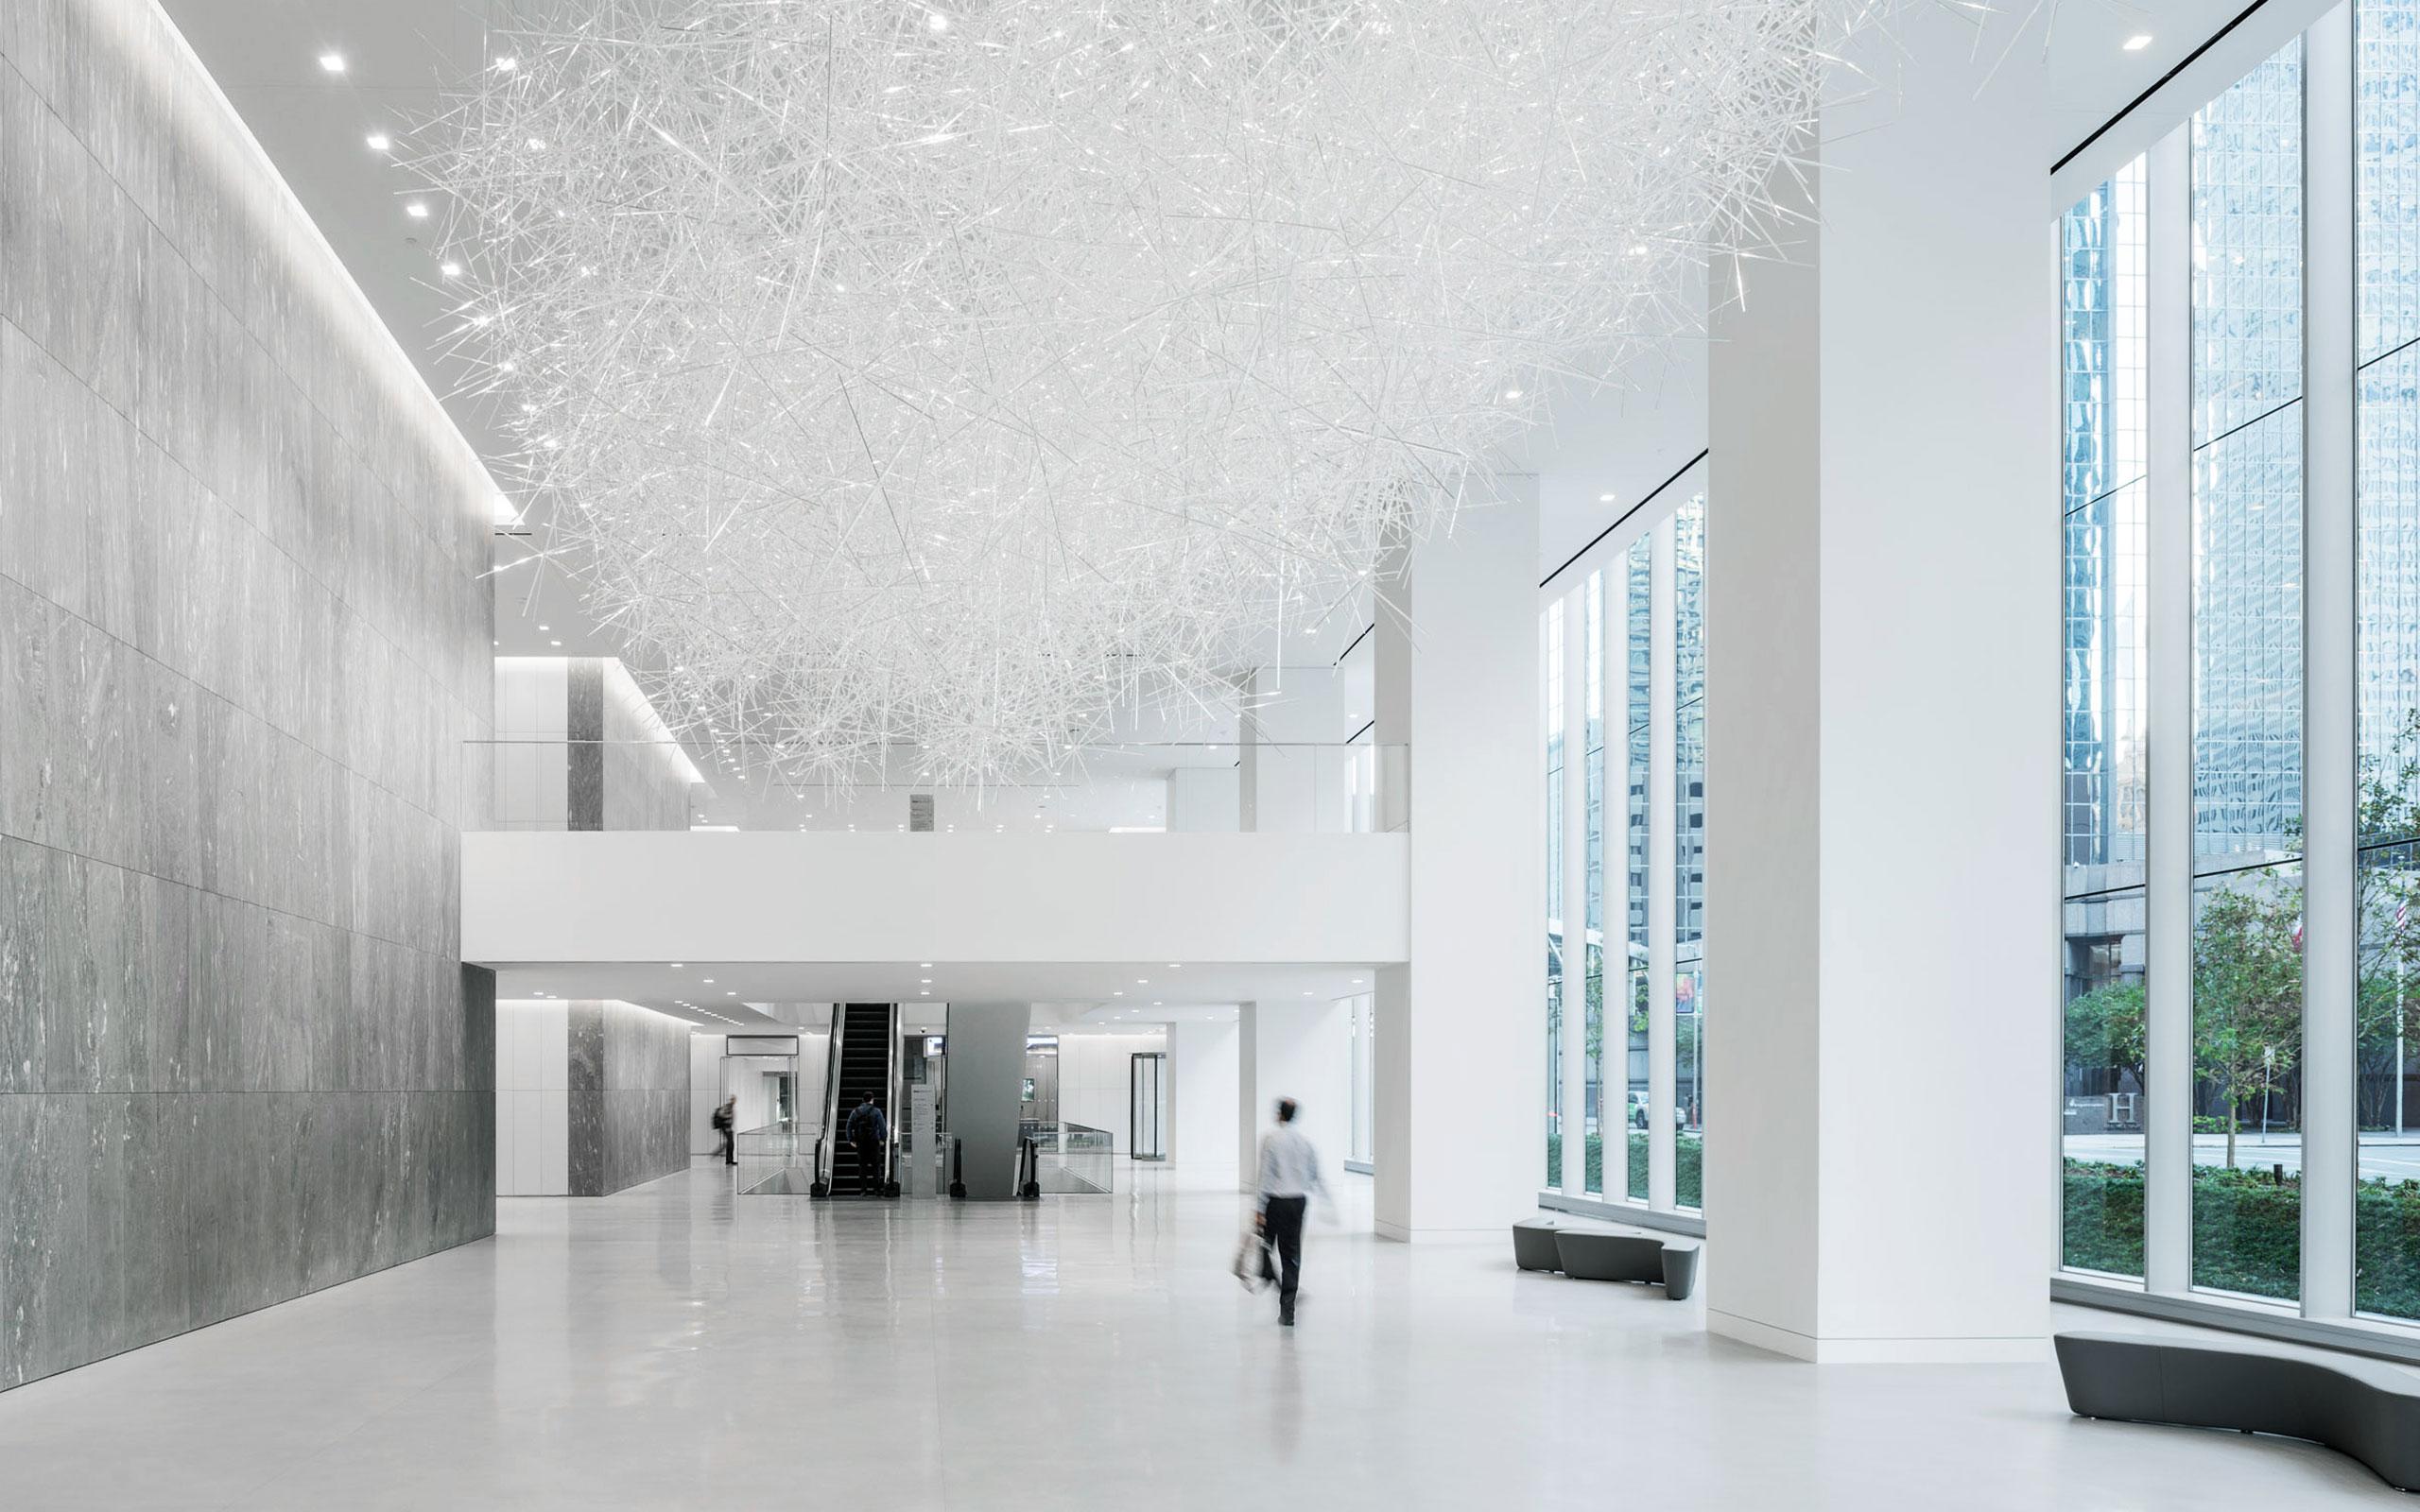 Allen Center New Art Project 'Prismatic Cloud' by Tokujin Yoshioka